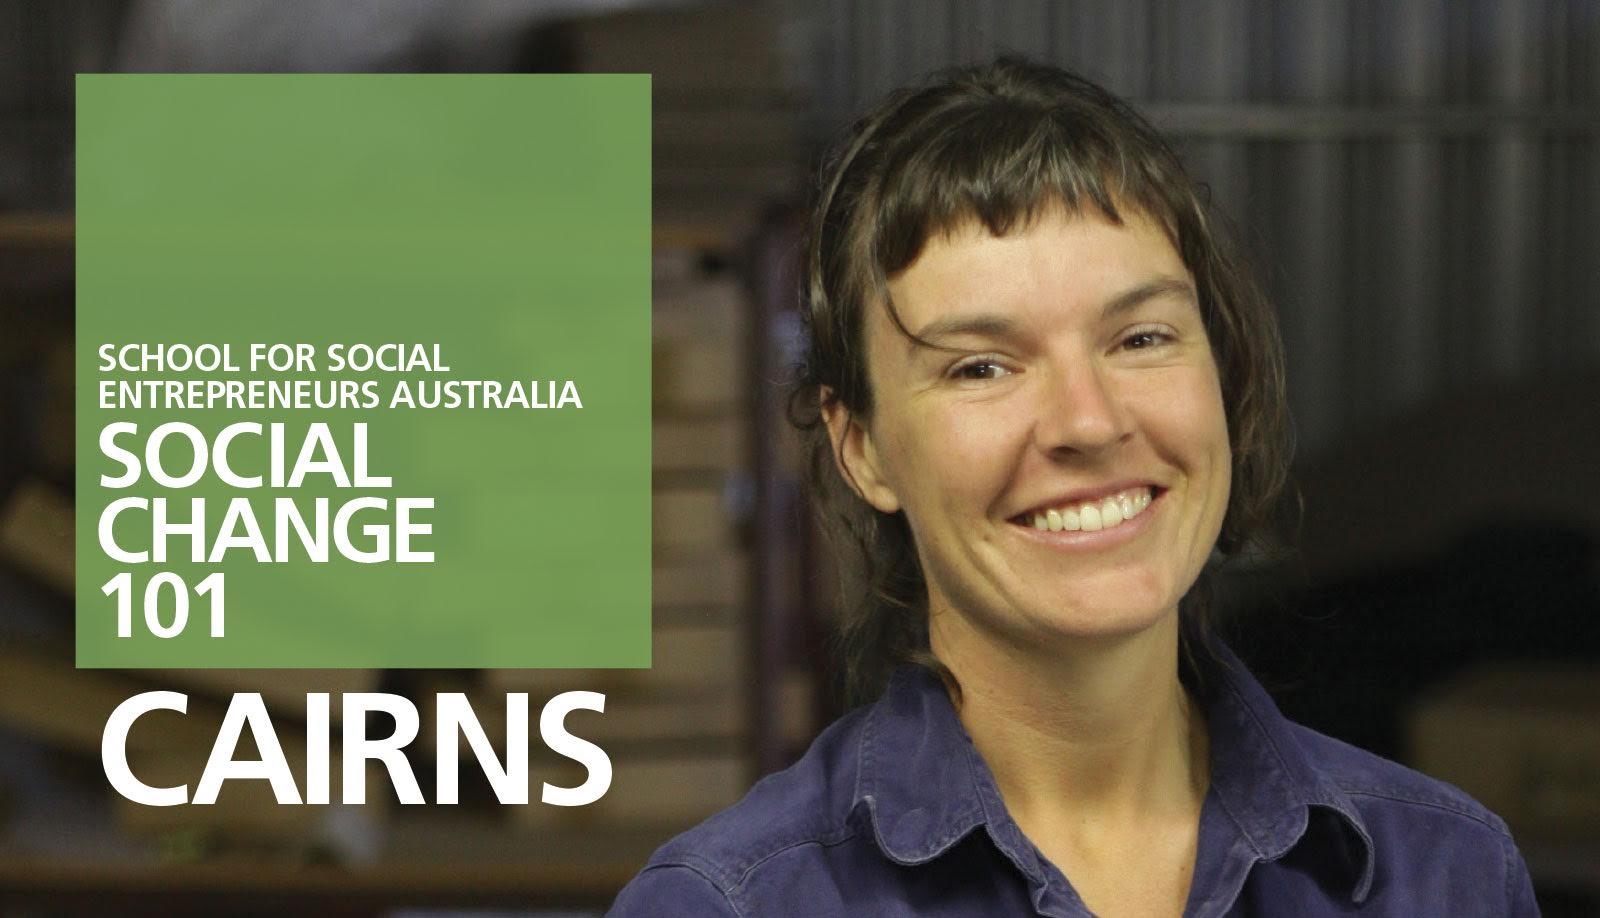 Social Change 101 Cairns